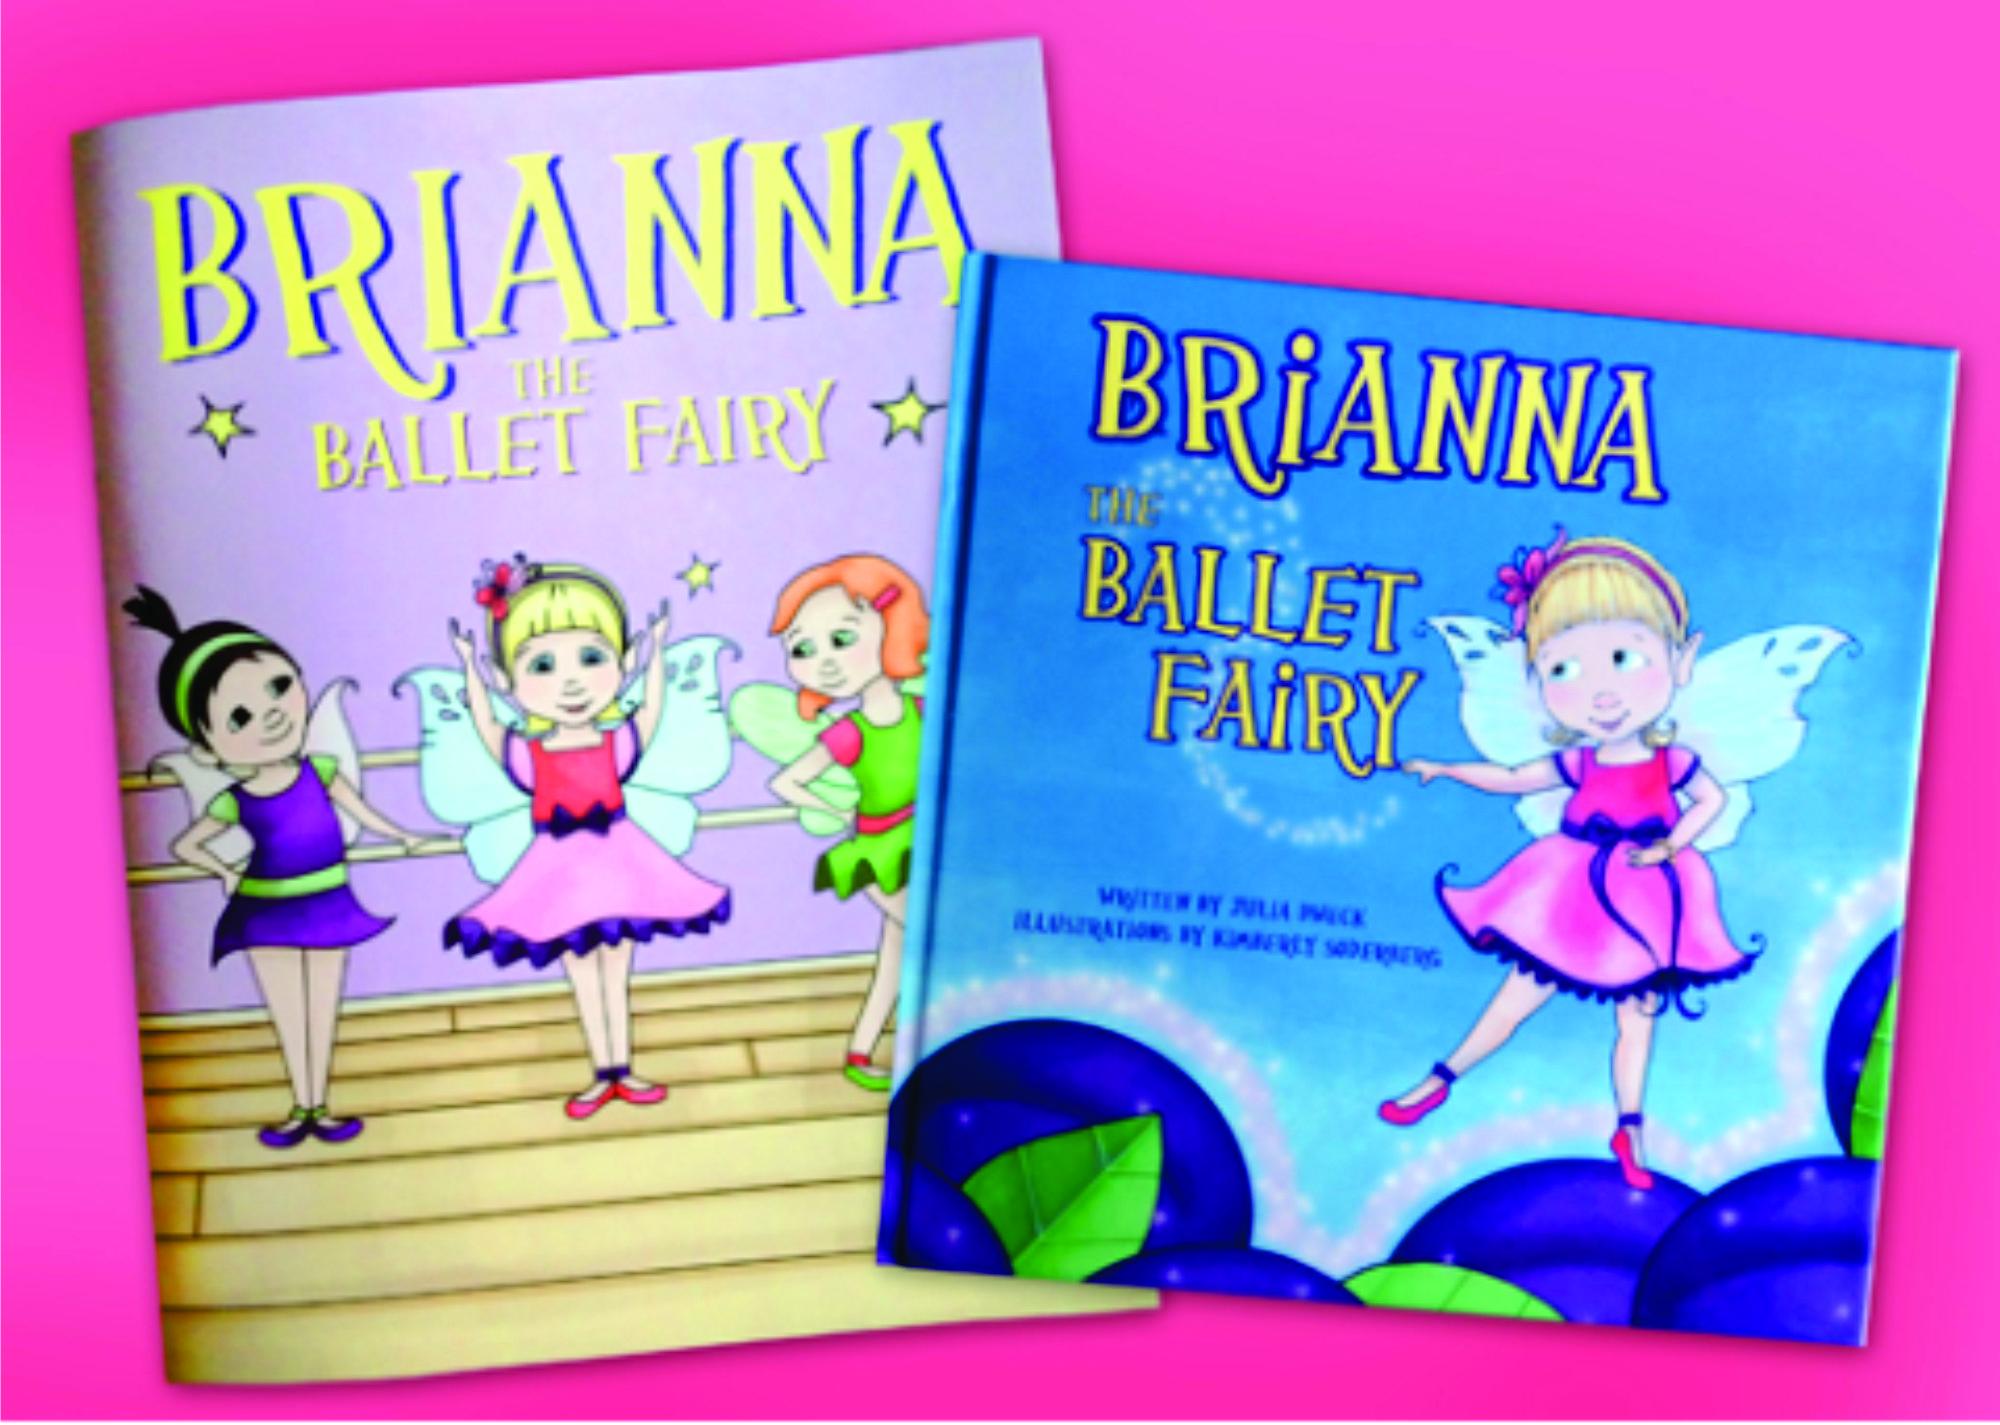 Brianna story book.jpg